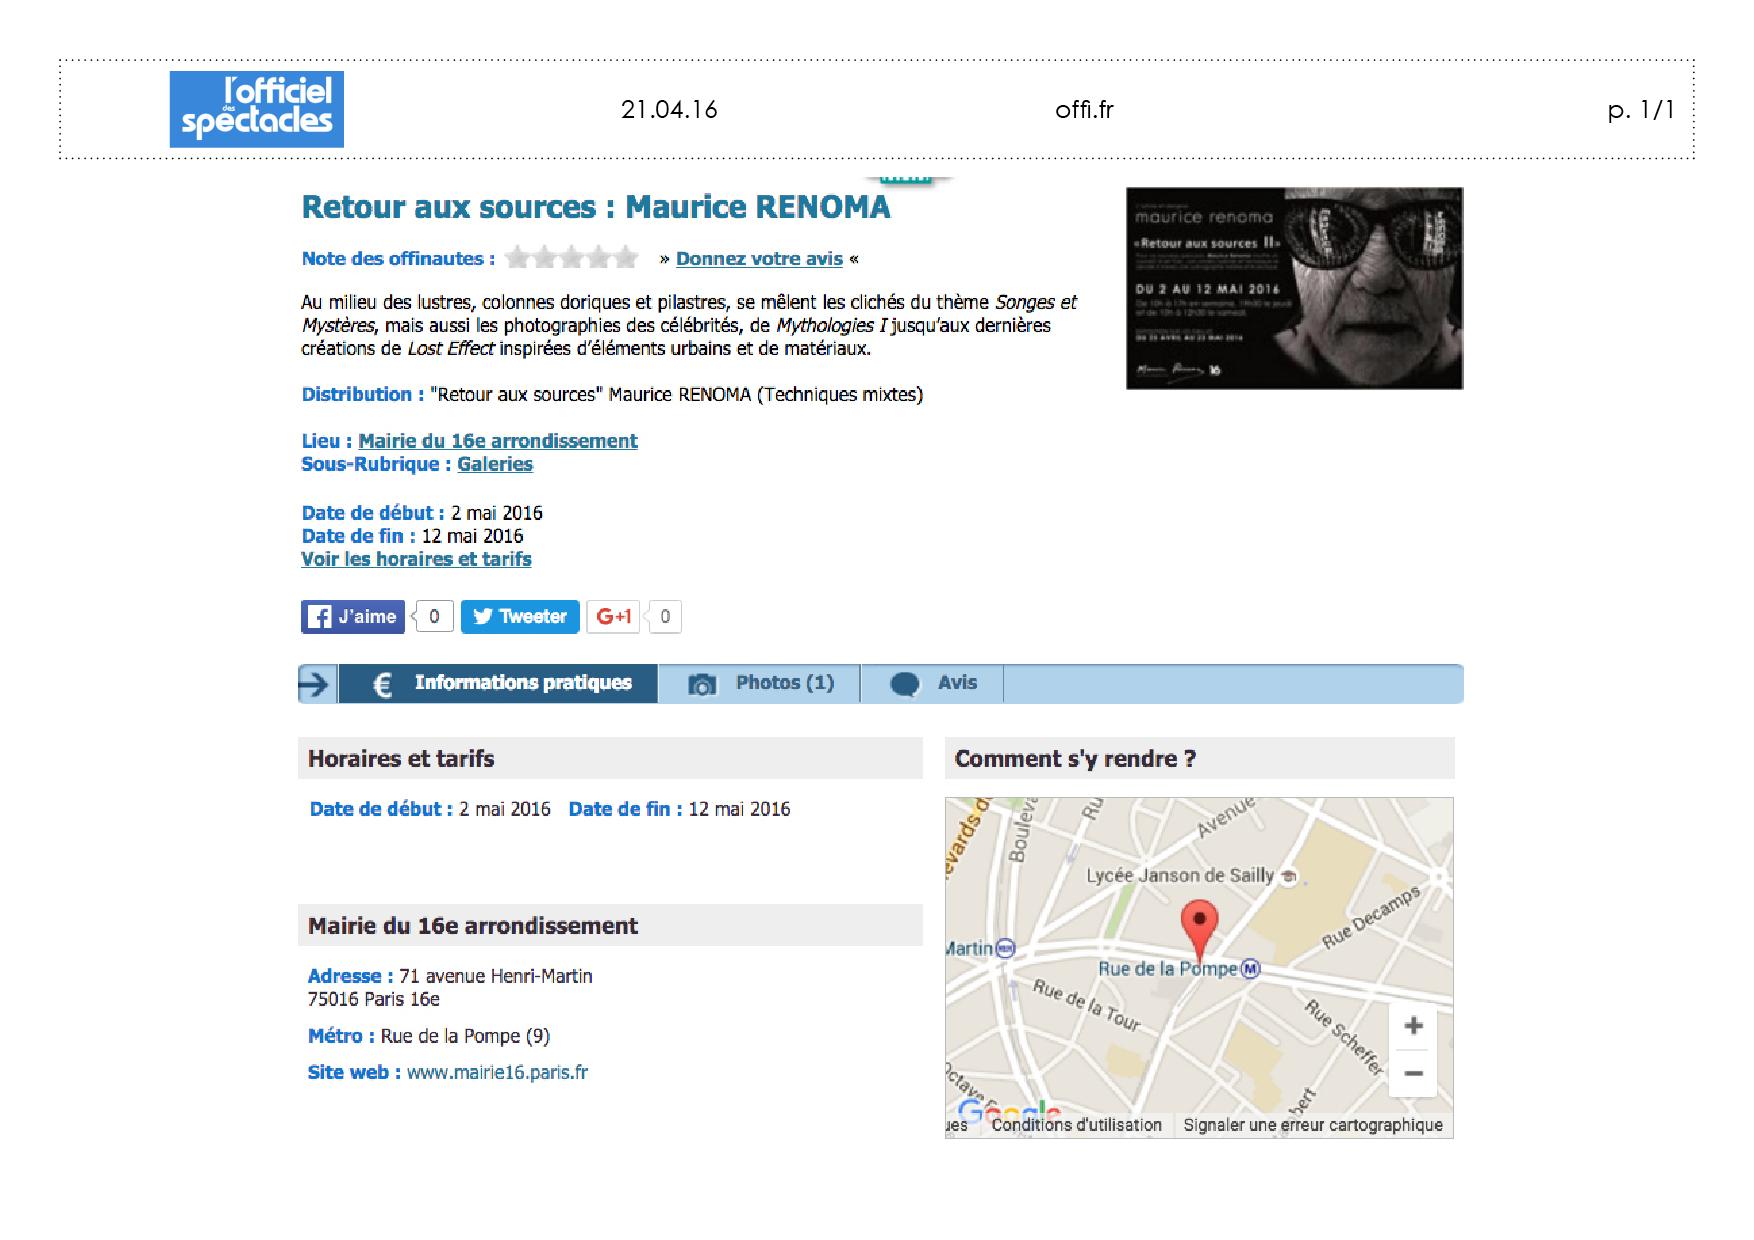 PRESSE_BOOK_RETOURAUXSOURCESII10